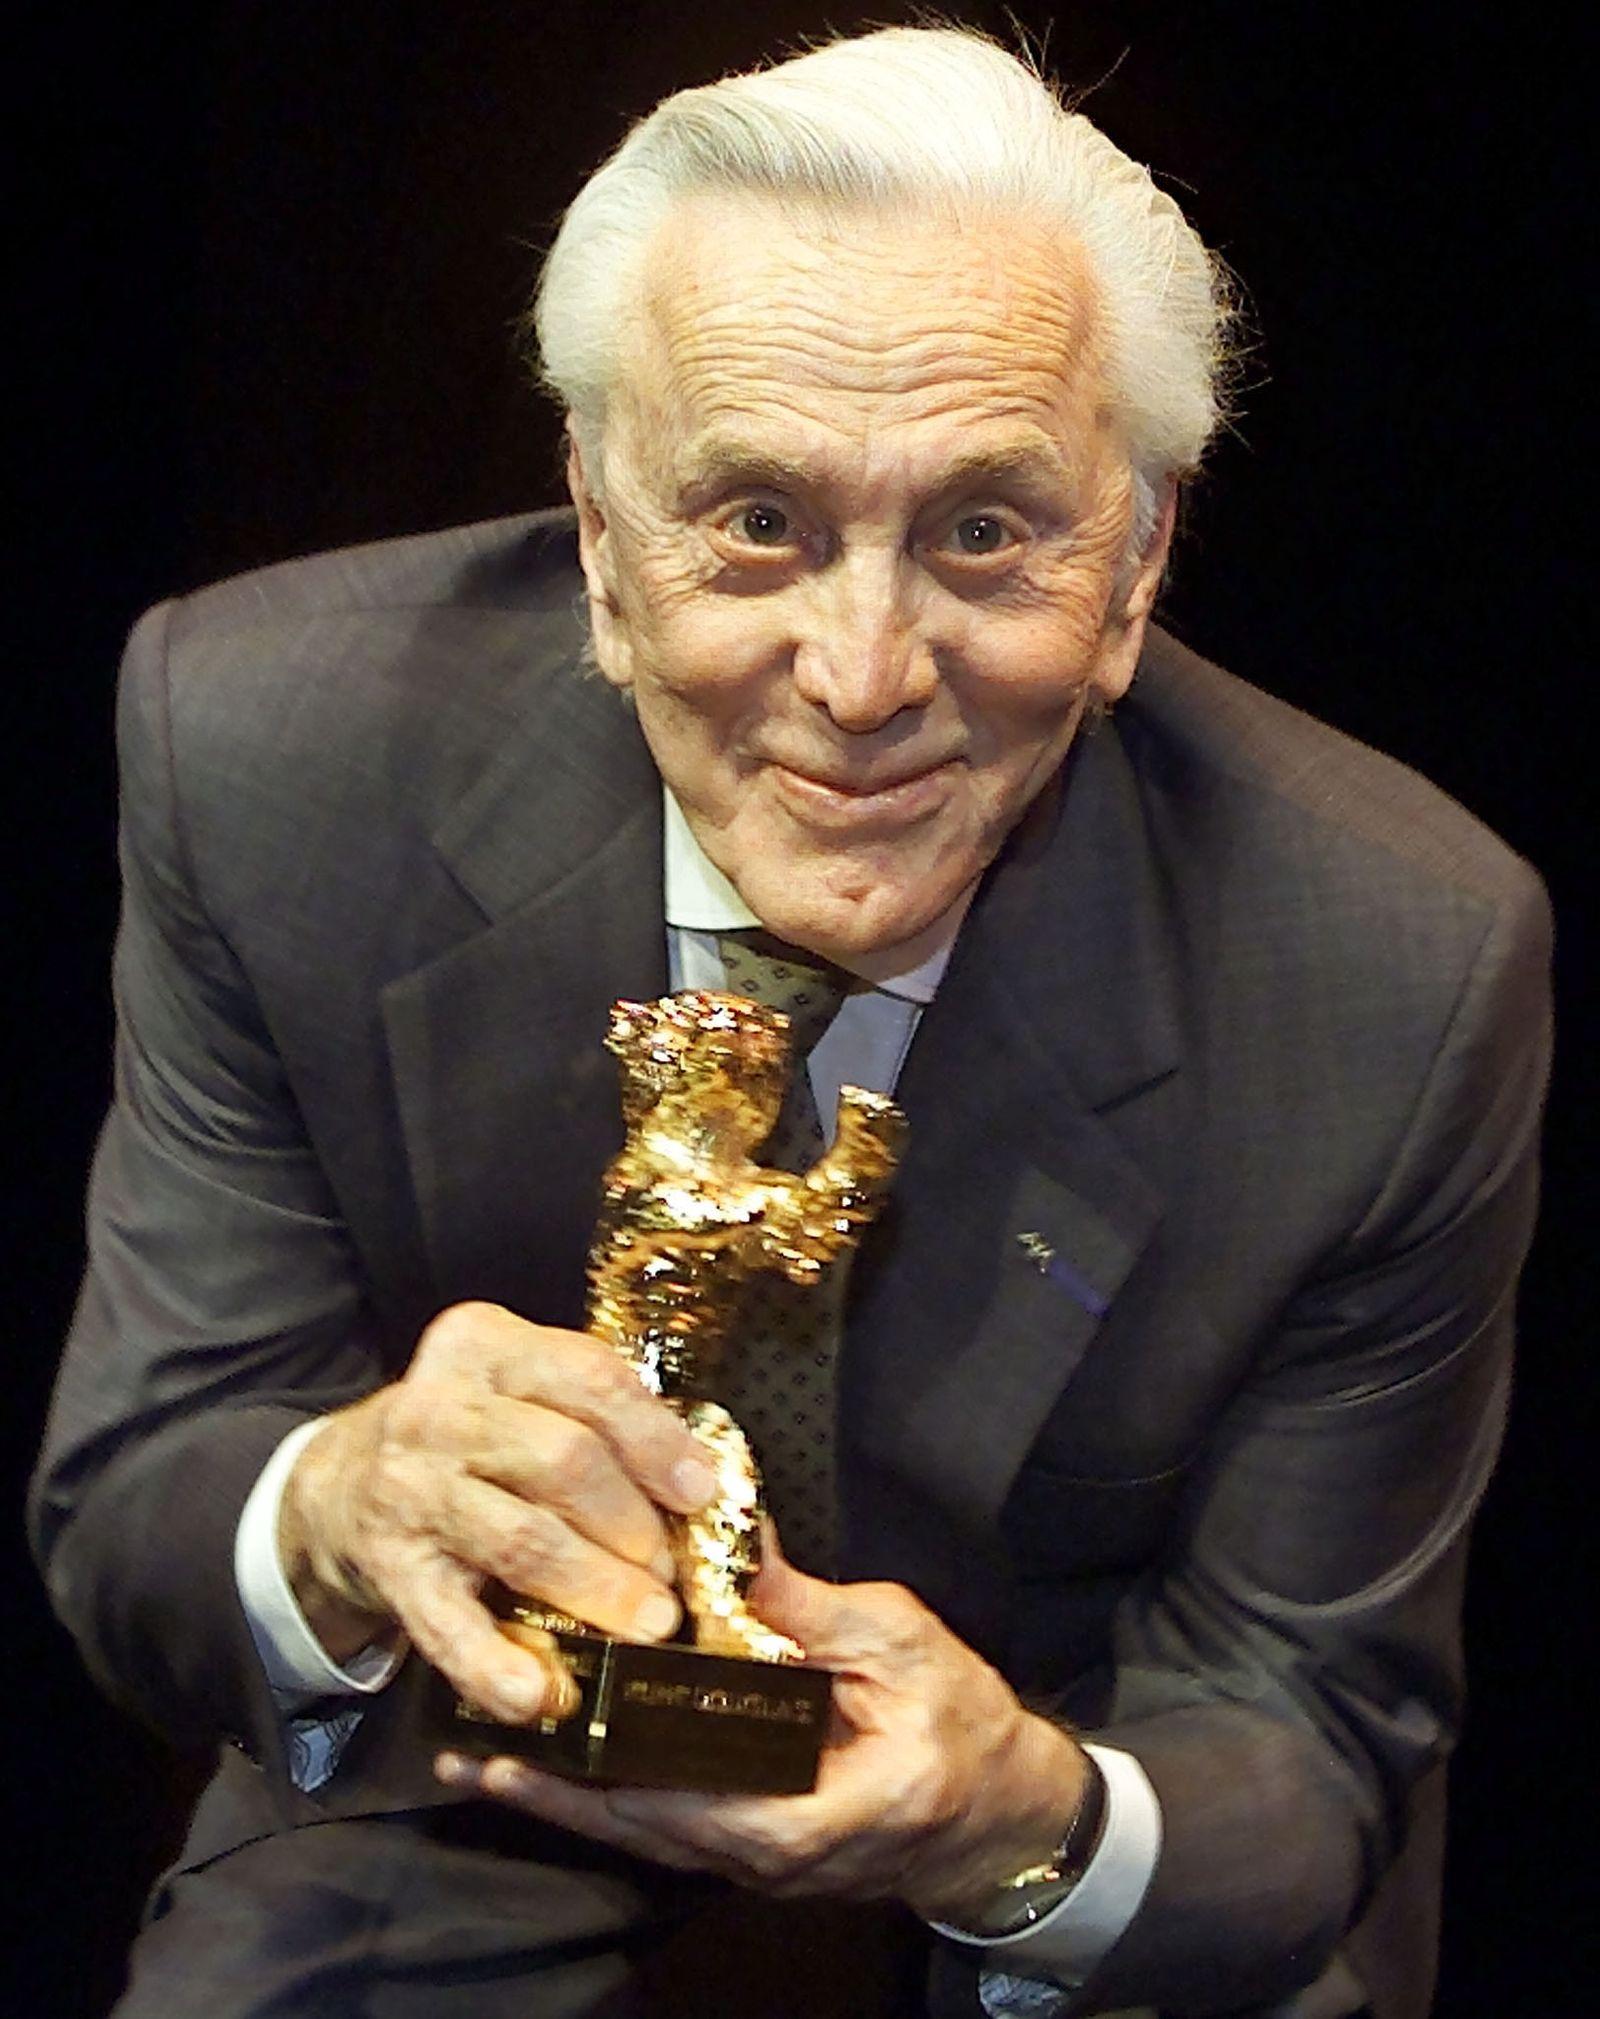 US ACTOR KIRK DOUGLAS RECEIVES GOLDEN BEAR AWARD AT BERLINALE FILM FESTIVAL IN BERLIN.